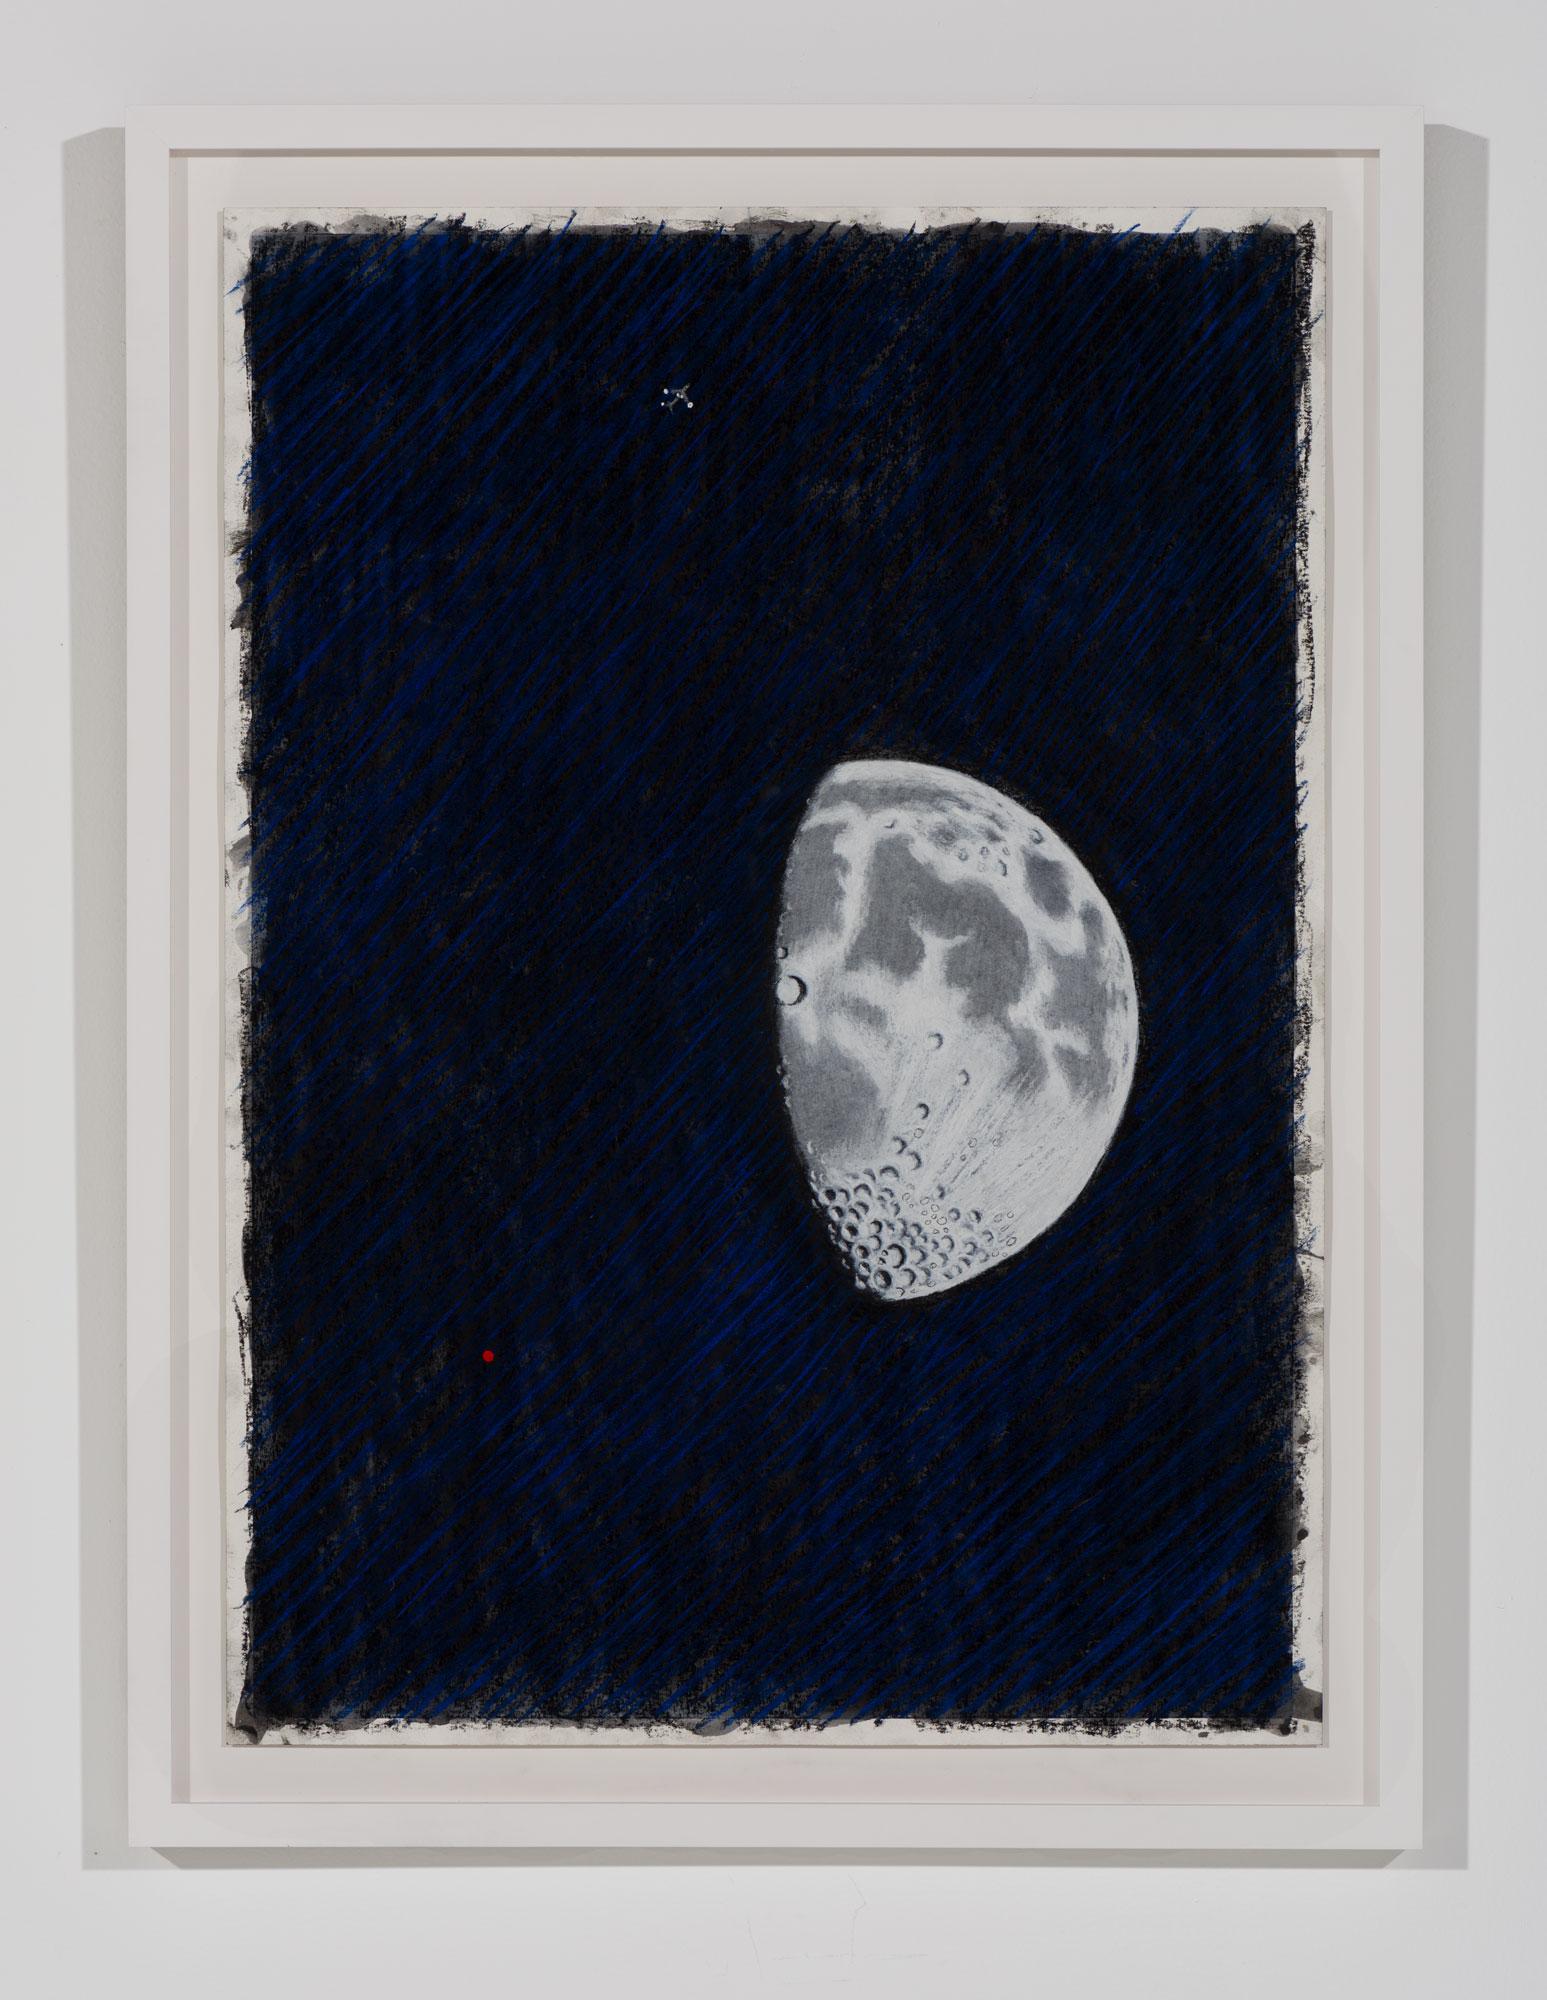 The Moon 8.20.18, 2018